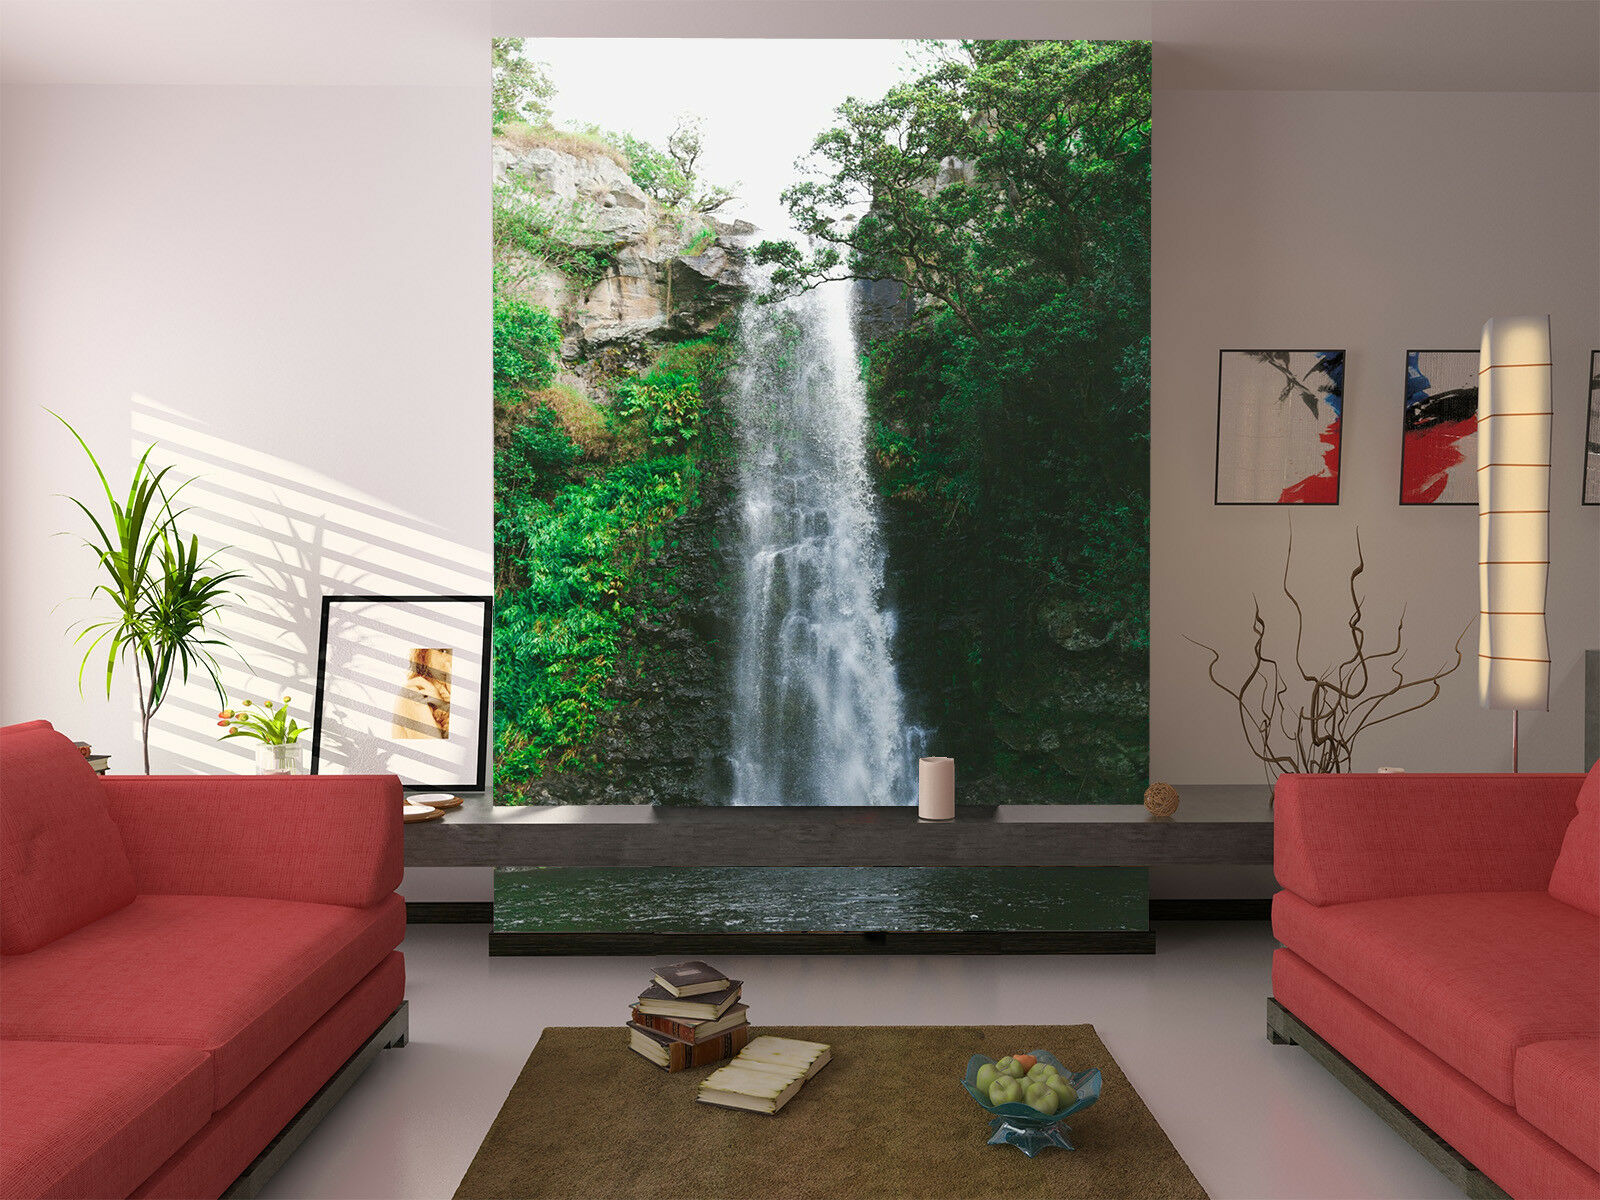 3D Waterfall 448 Wallpaper Murals Wall Print Wallpaper Mural AJ WALL AU Kyra